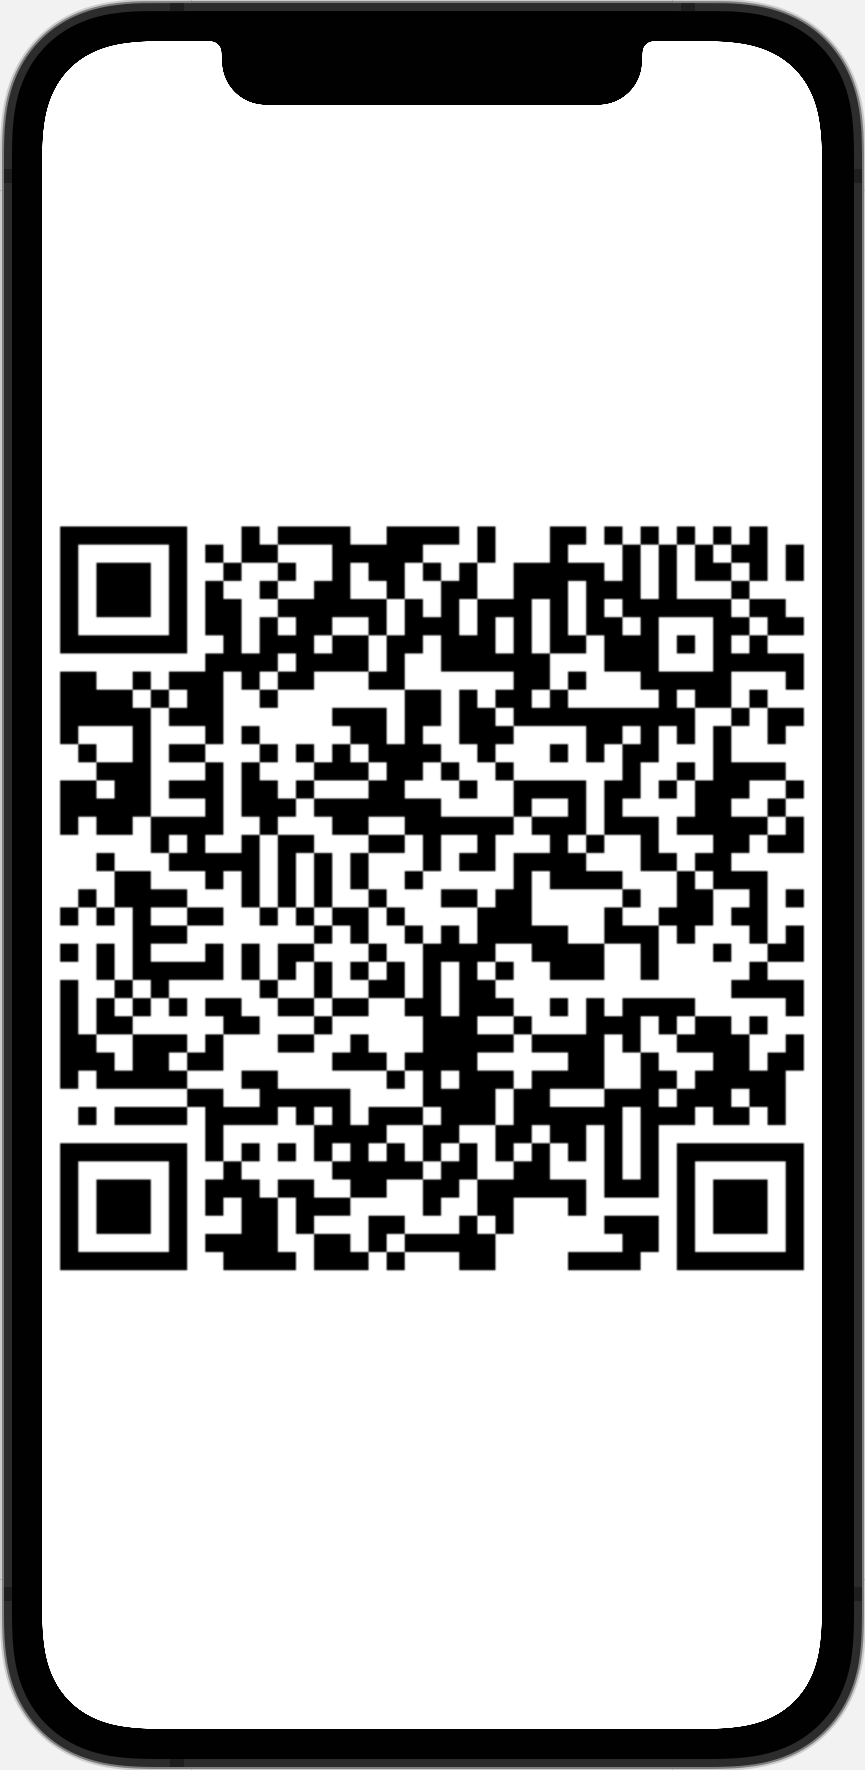 Sample Algorand QR Code 3